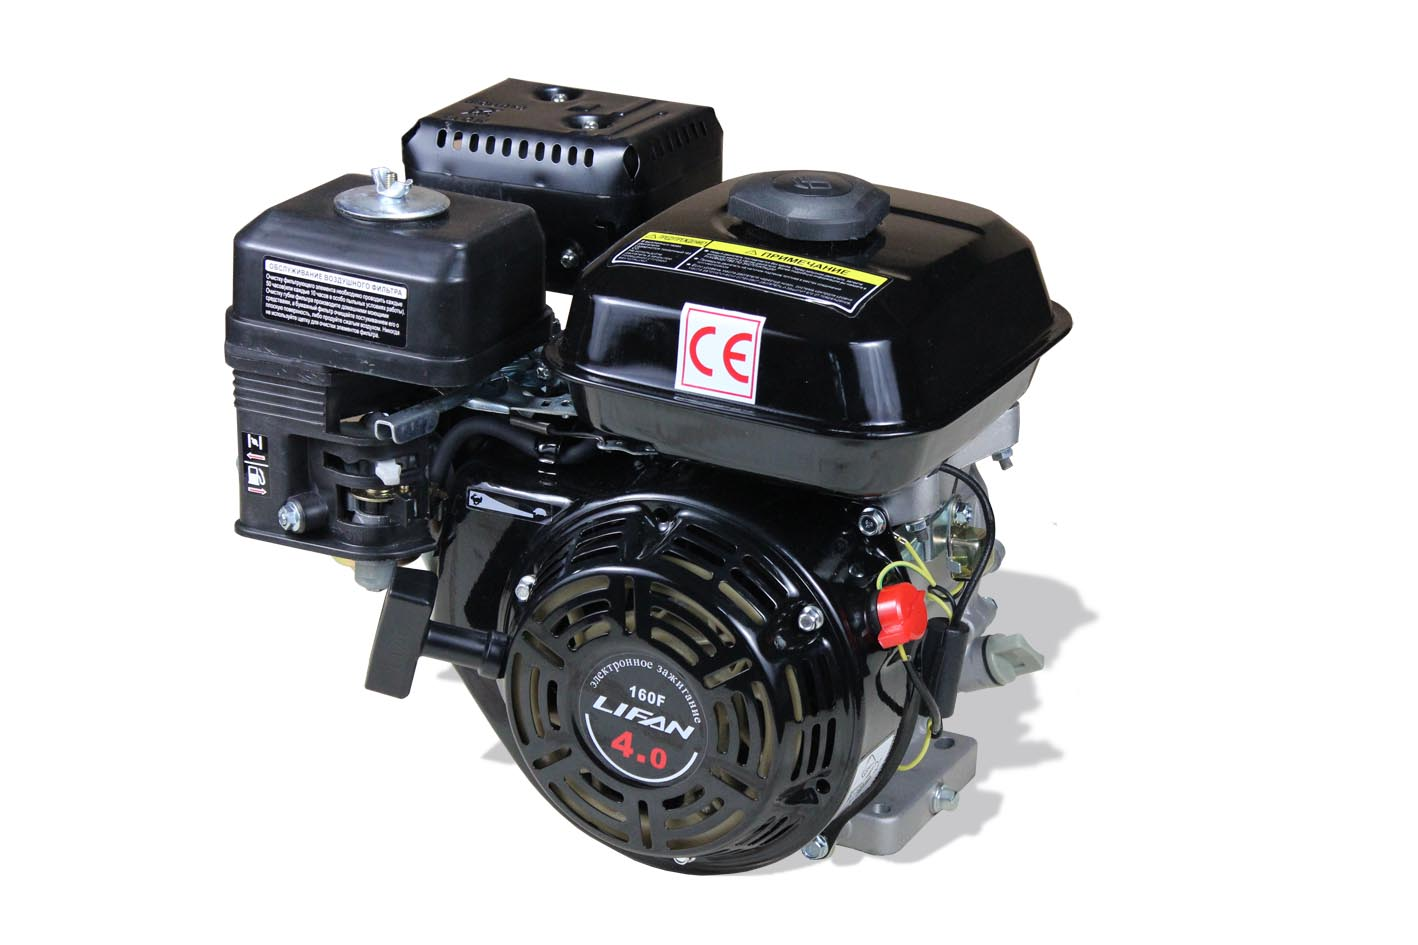 Двигатель Lifan 160f двигатель бензиновый 17 л с lifan 192fd 7а